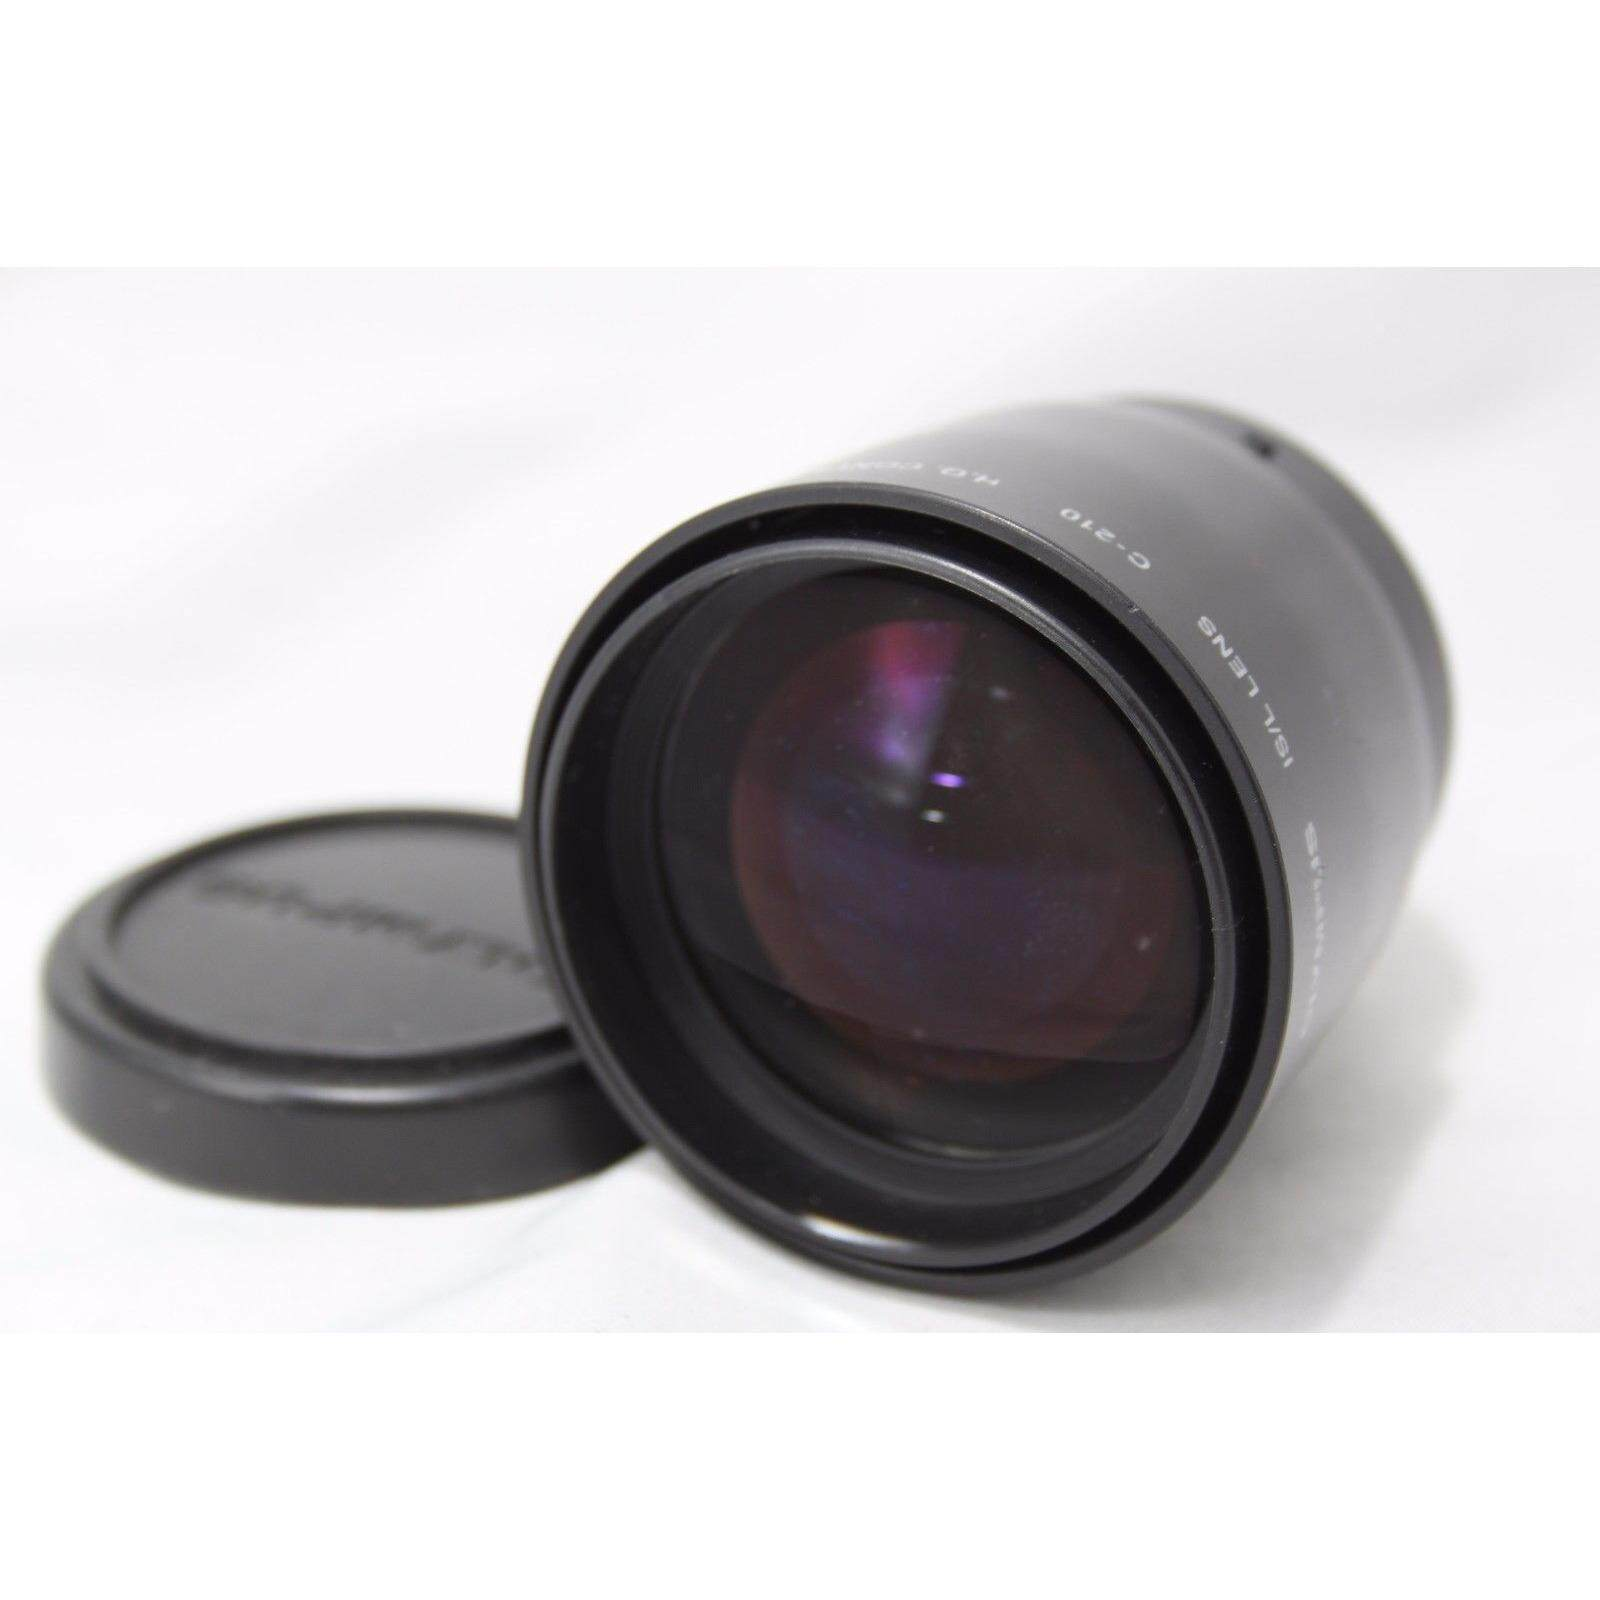 Cincin untuk adaptor Nikon g AF-S AI F lensa untuk Canon EOS EF Gunung